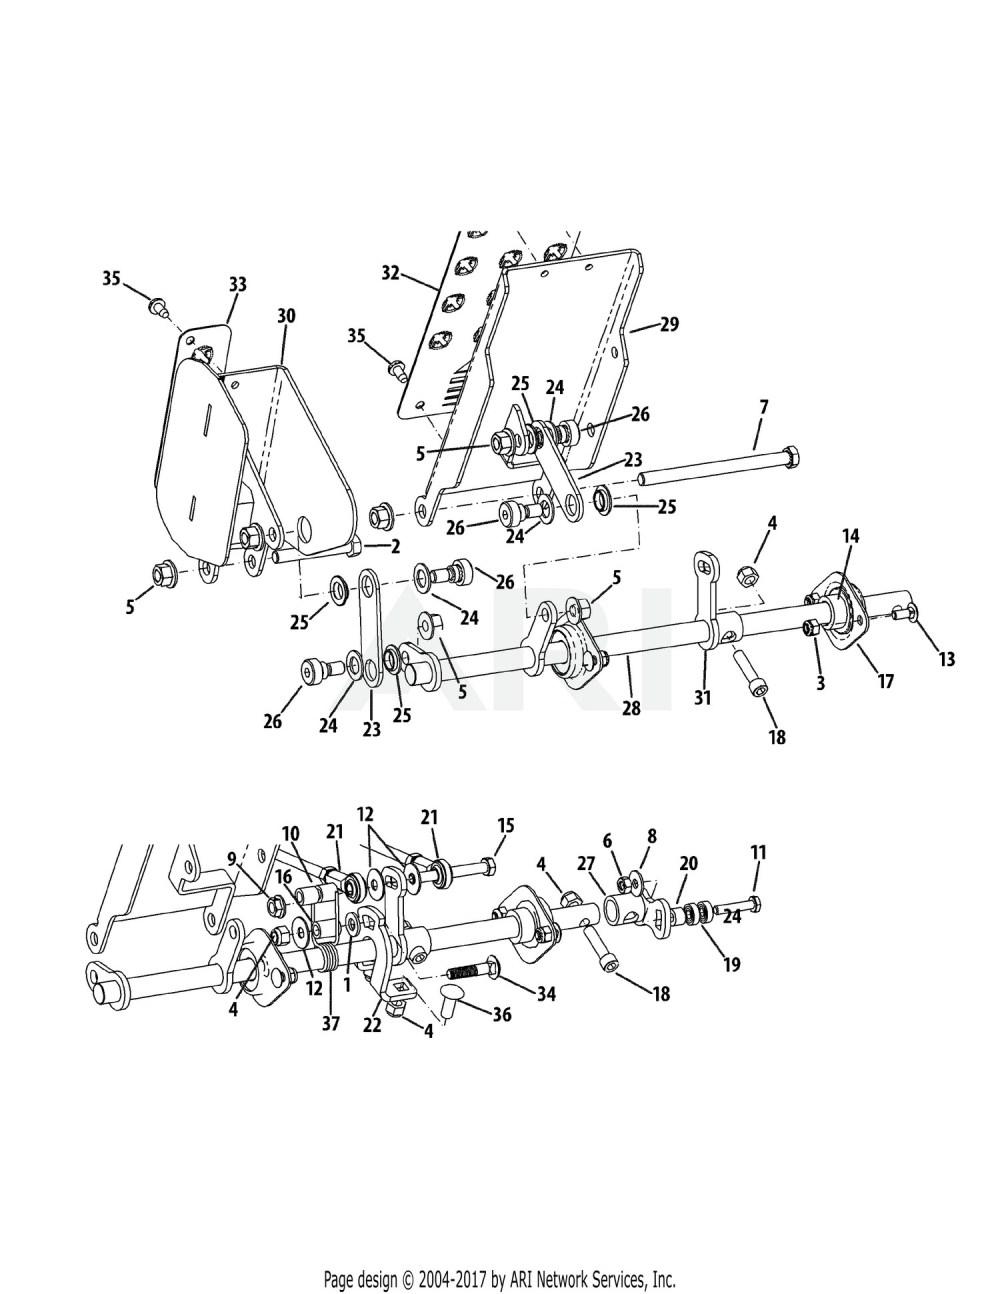 medium resolution of wiring diagram for cub cadet volunteer wiring diagrams cushman haulster wiring diagram cub cadet volunteer wiring diagram